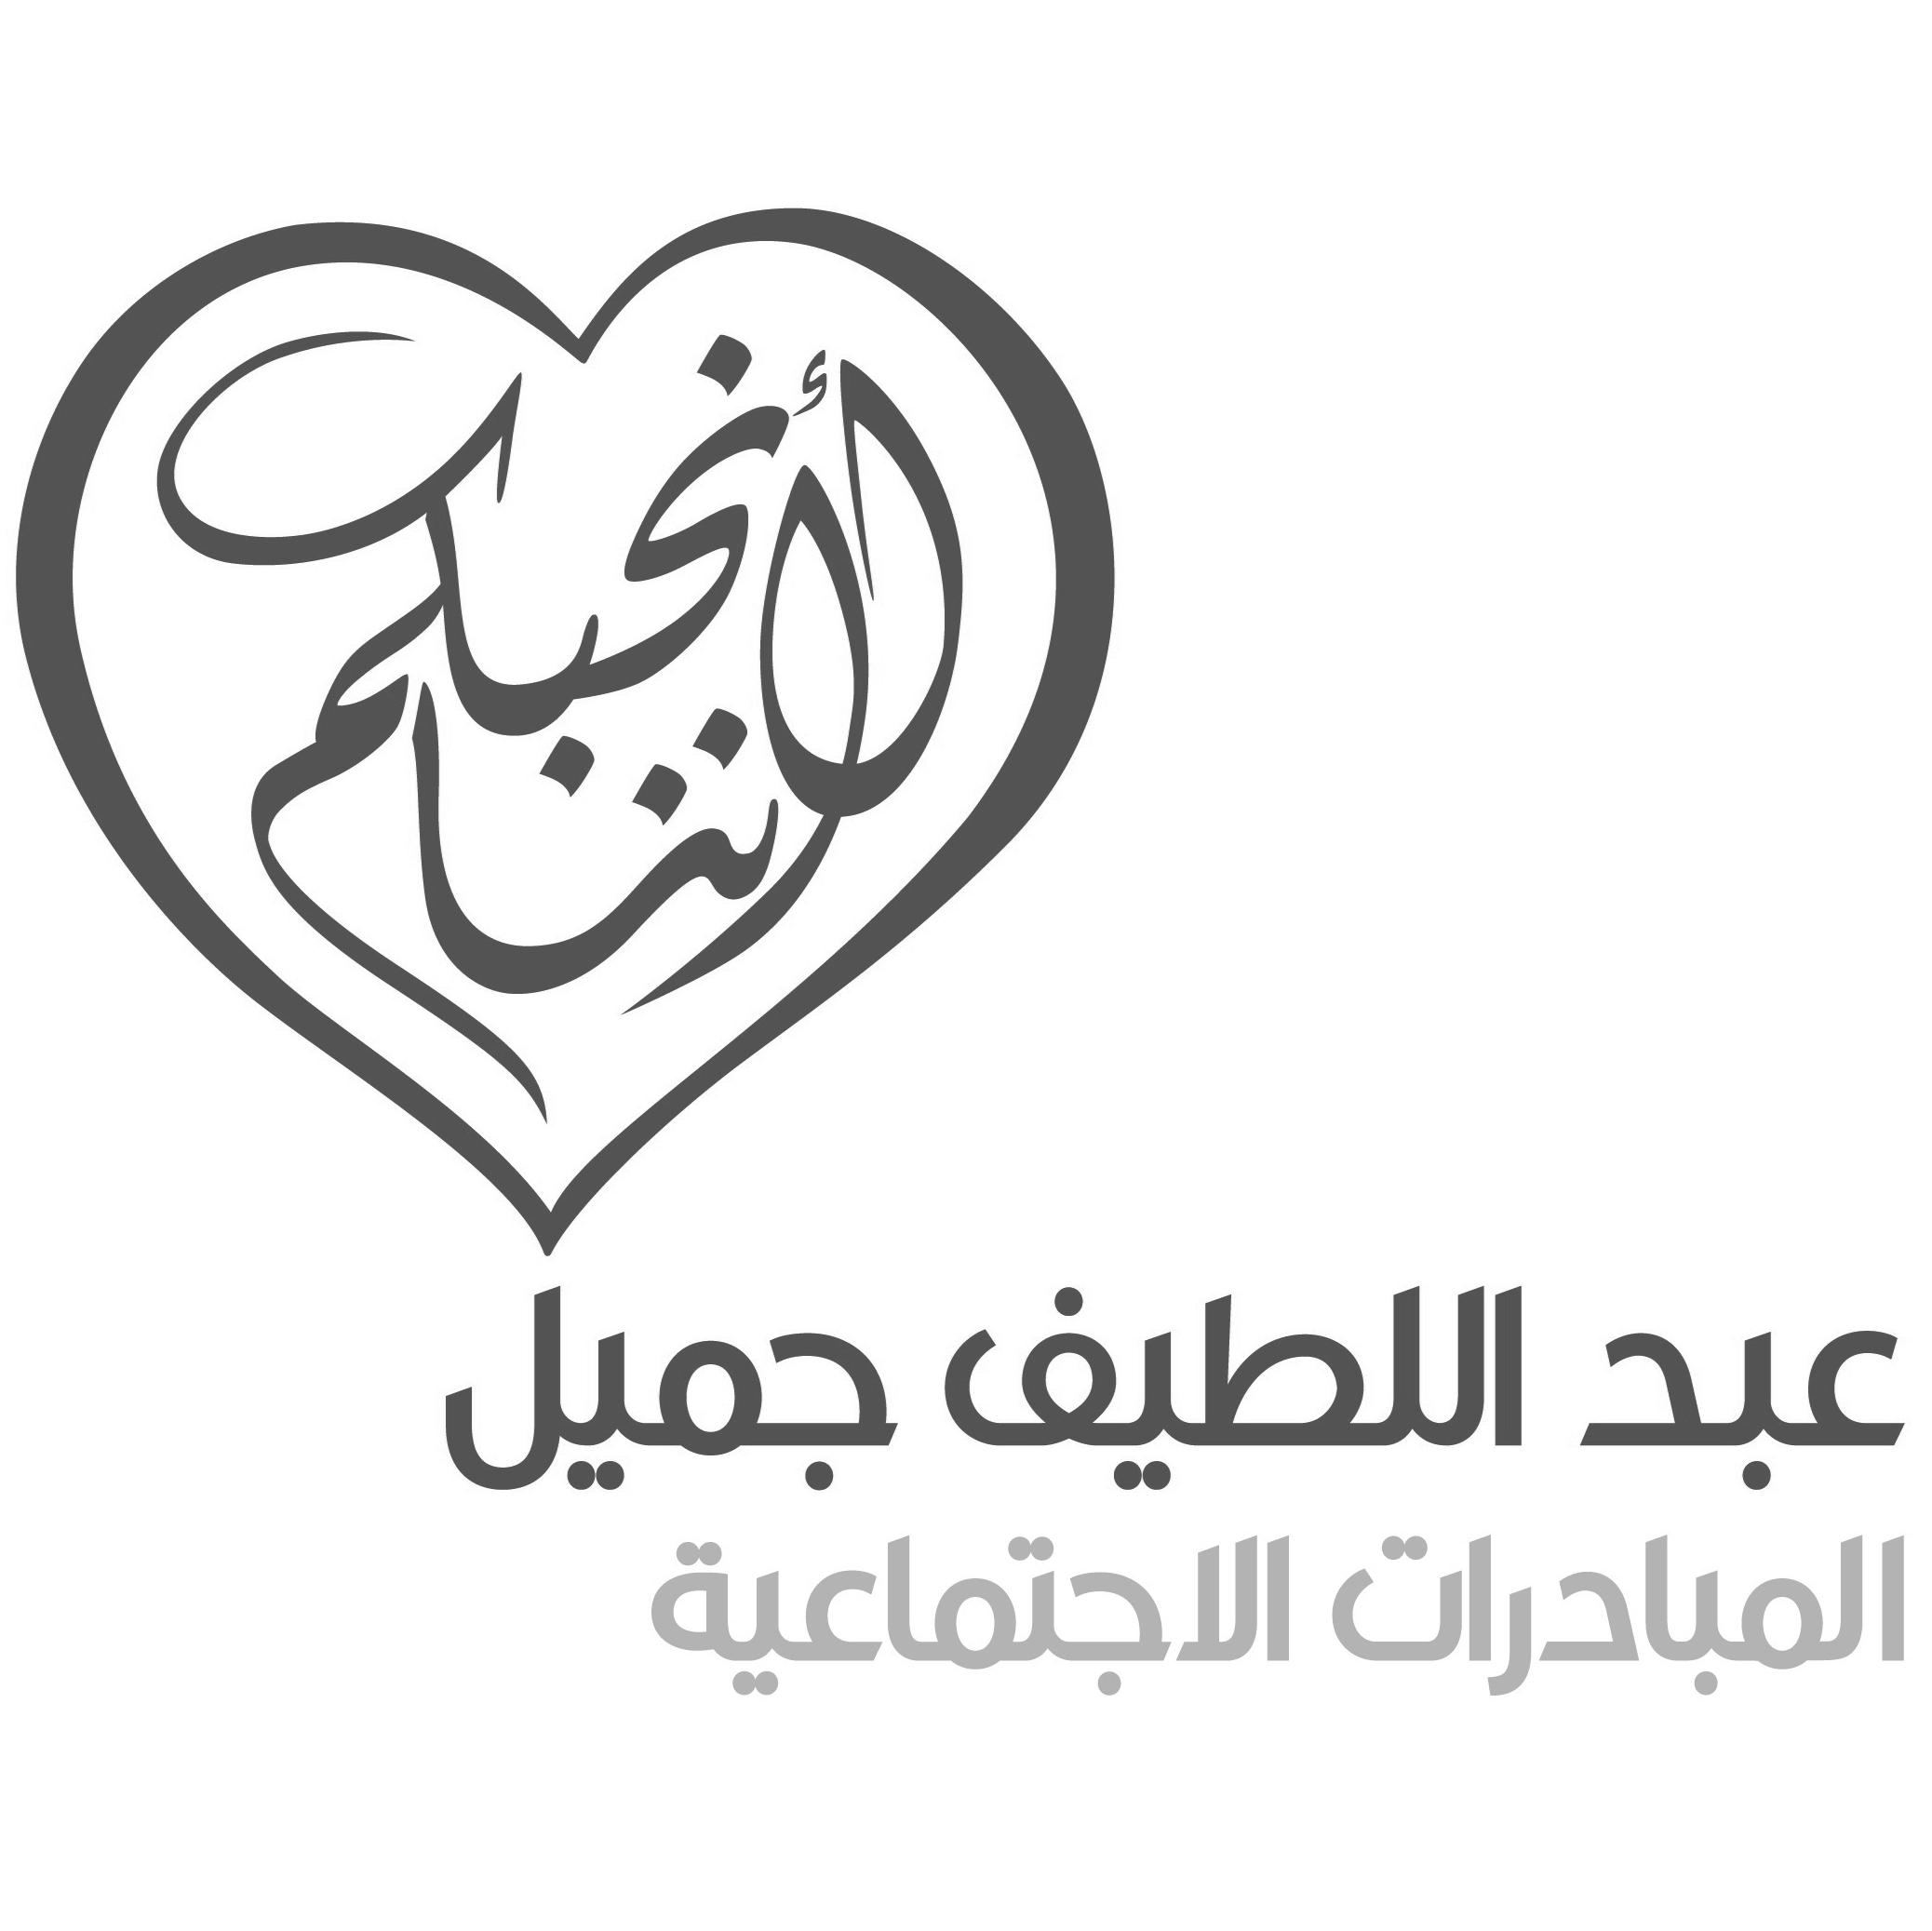 ALJCI-Logo_arabic-2.jpg